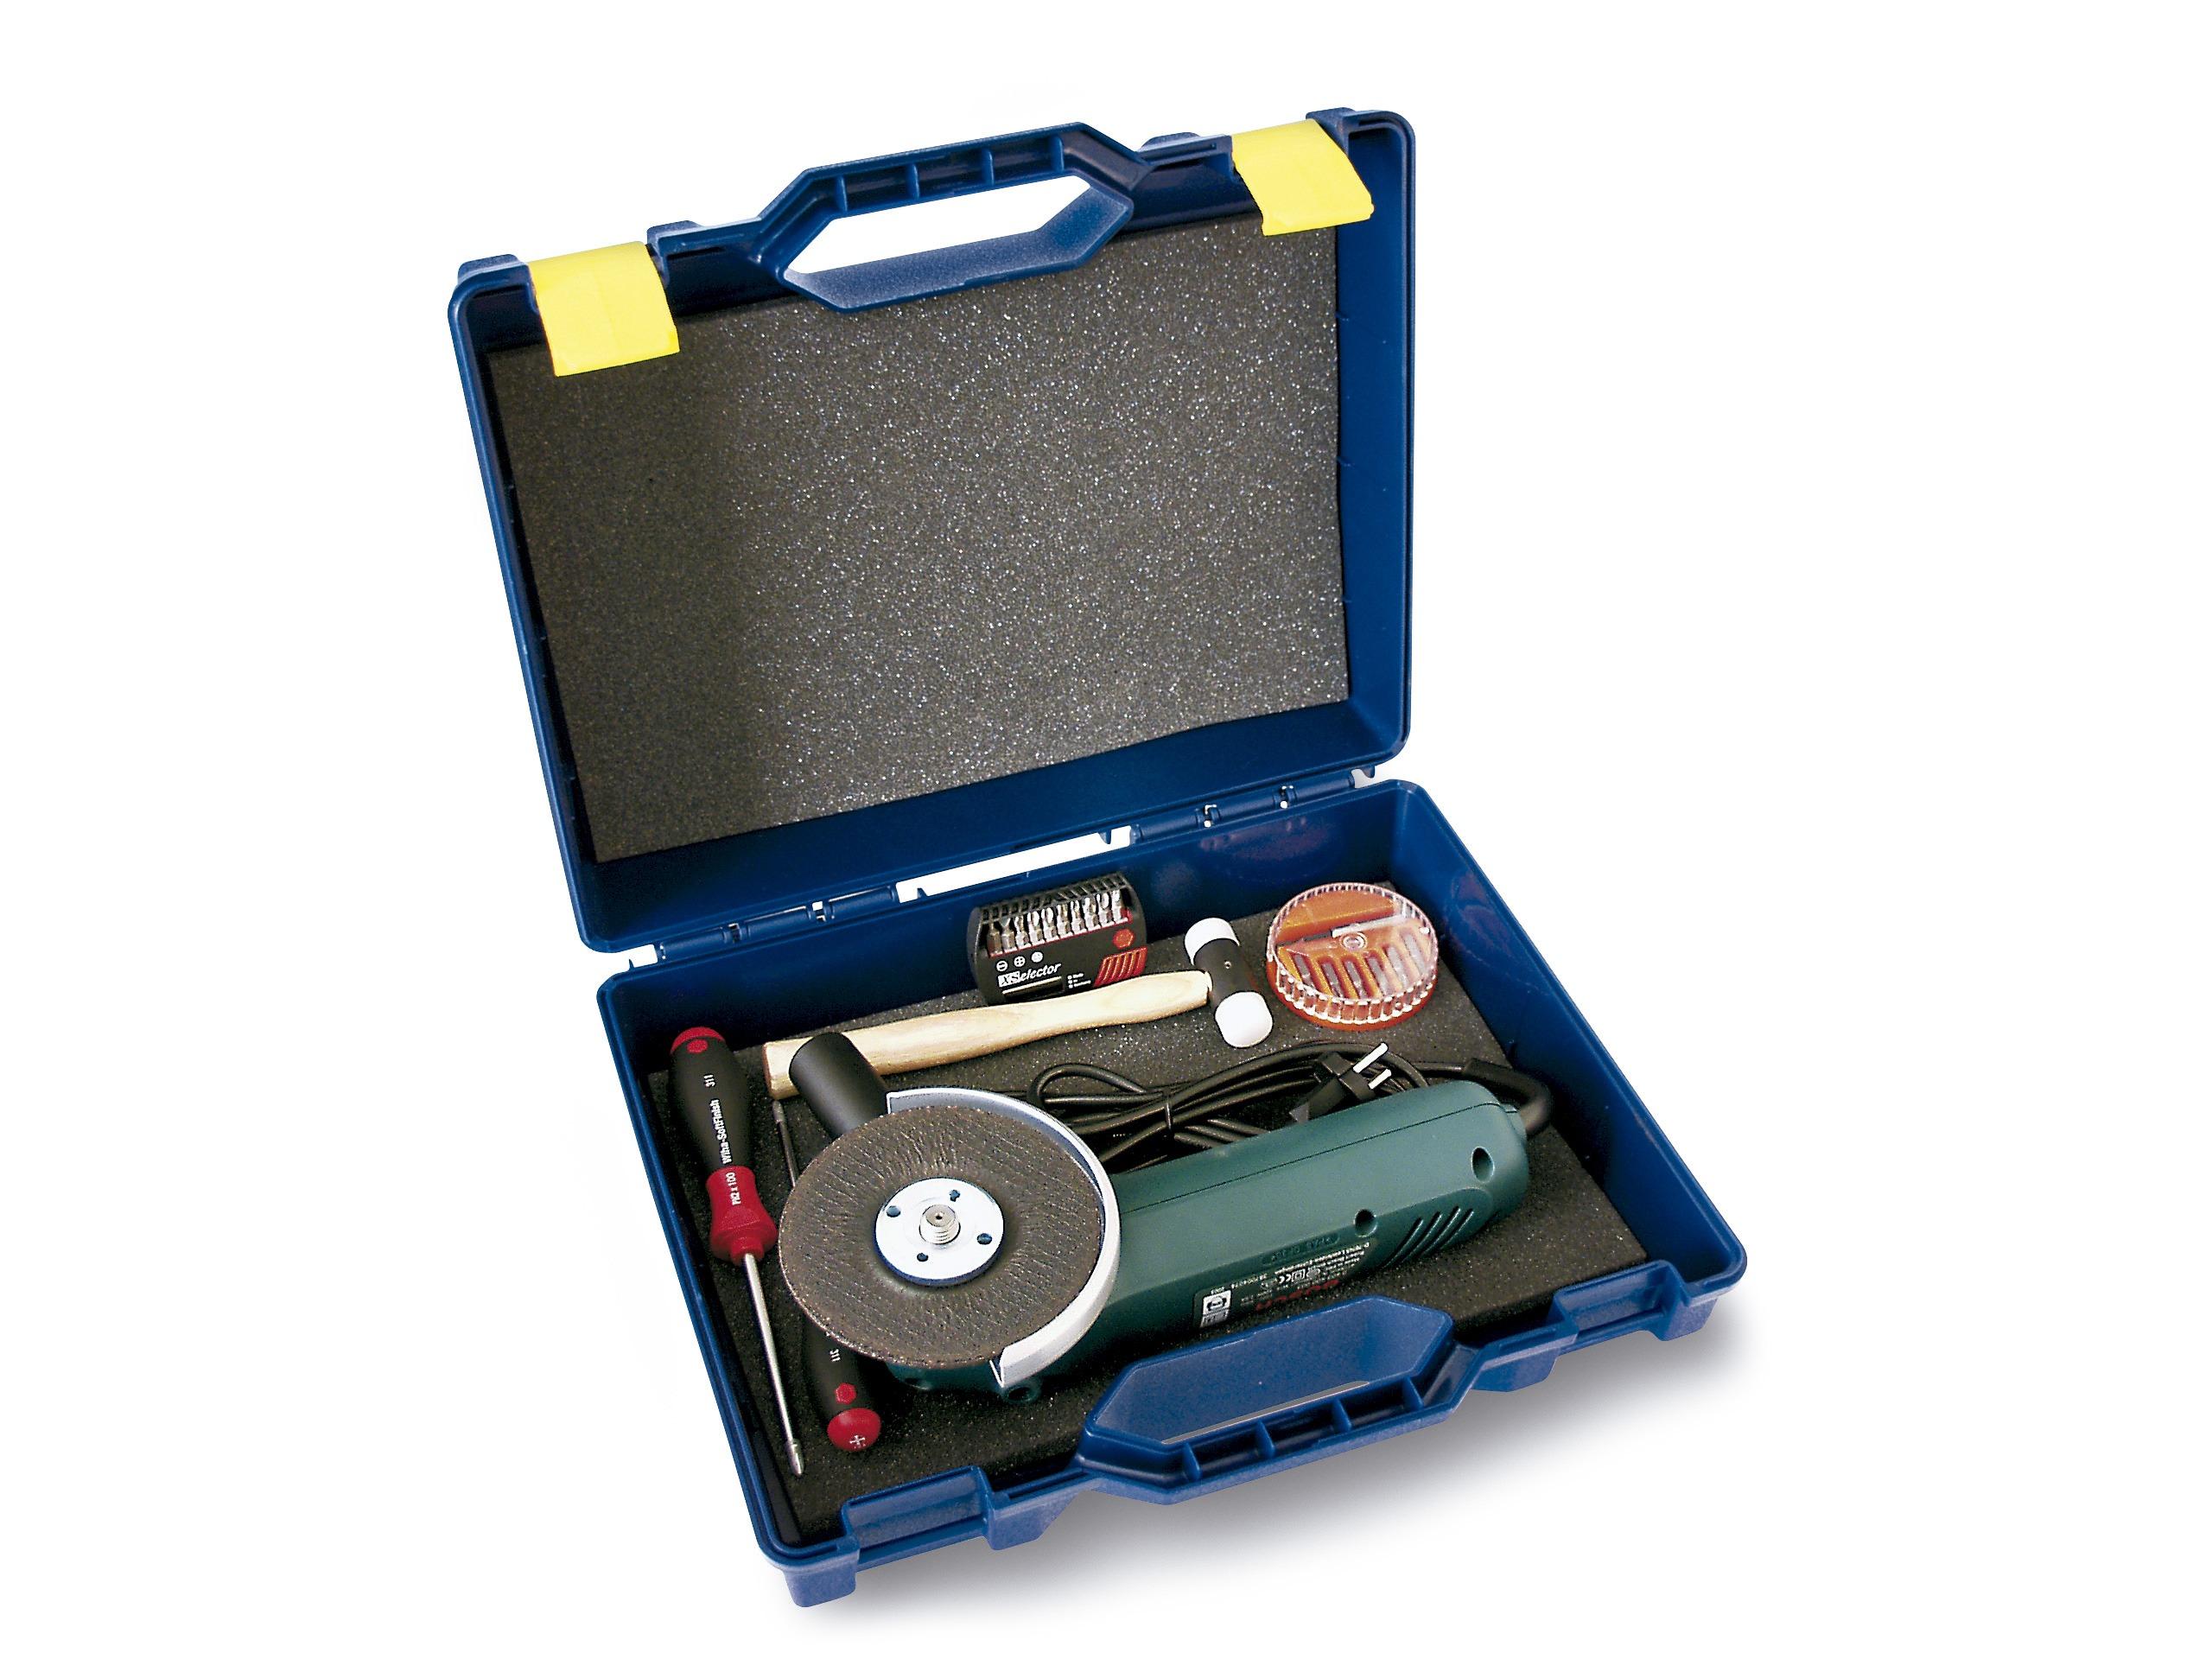 Maletas herramientas eléctricas mod. 40-41